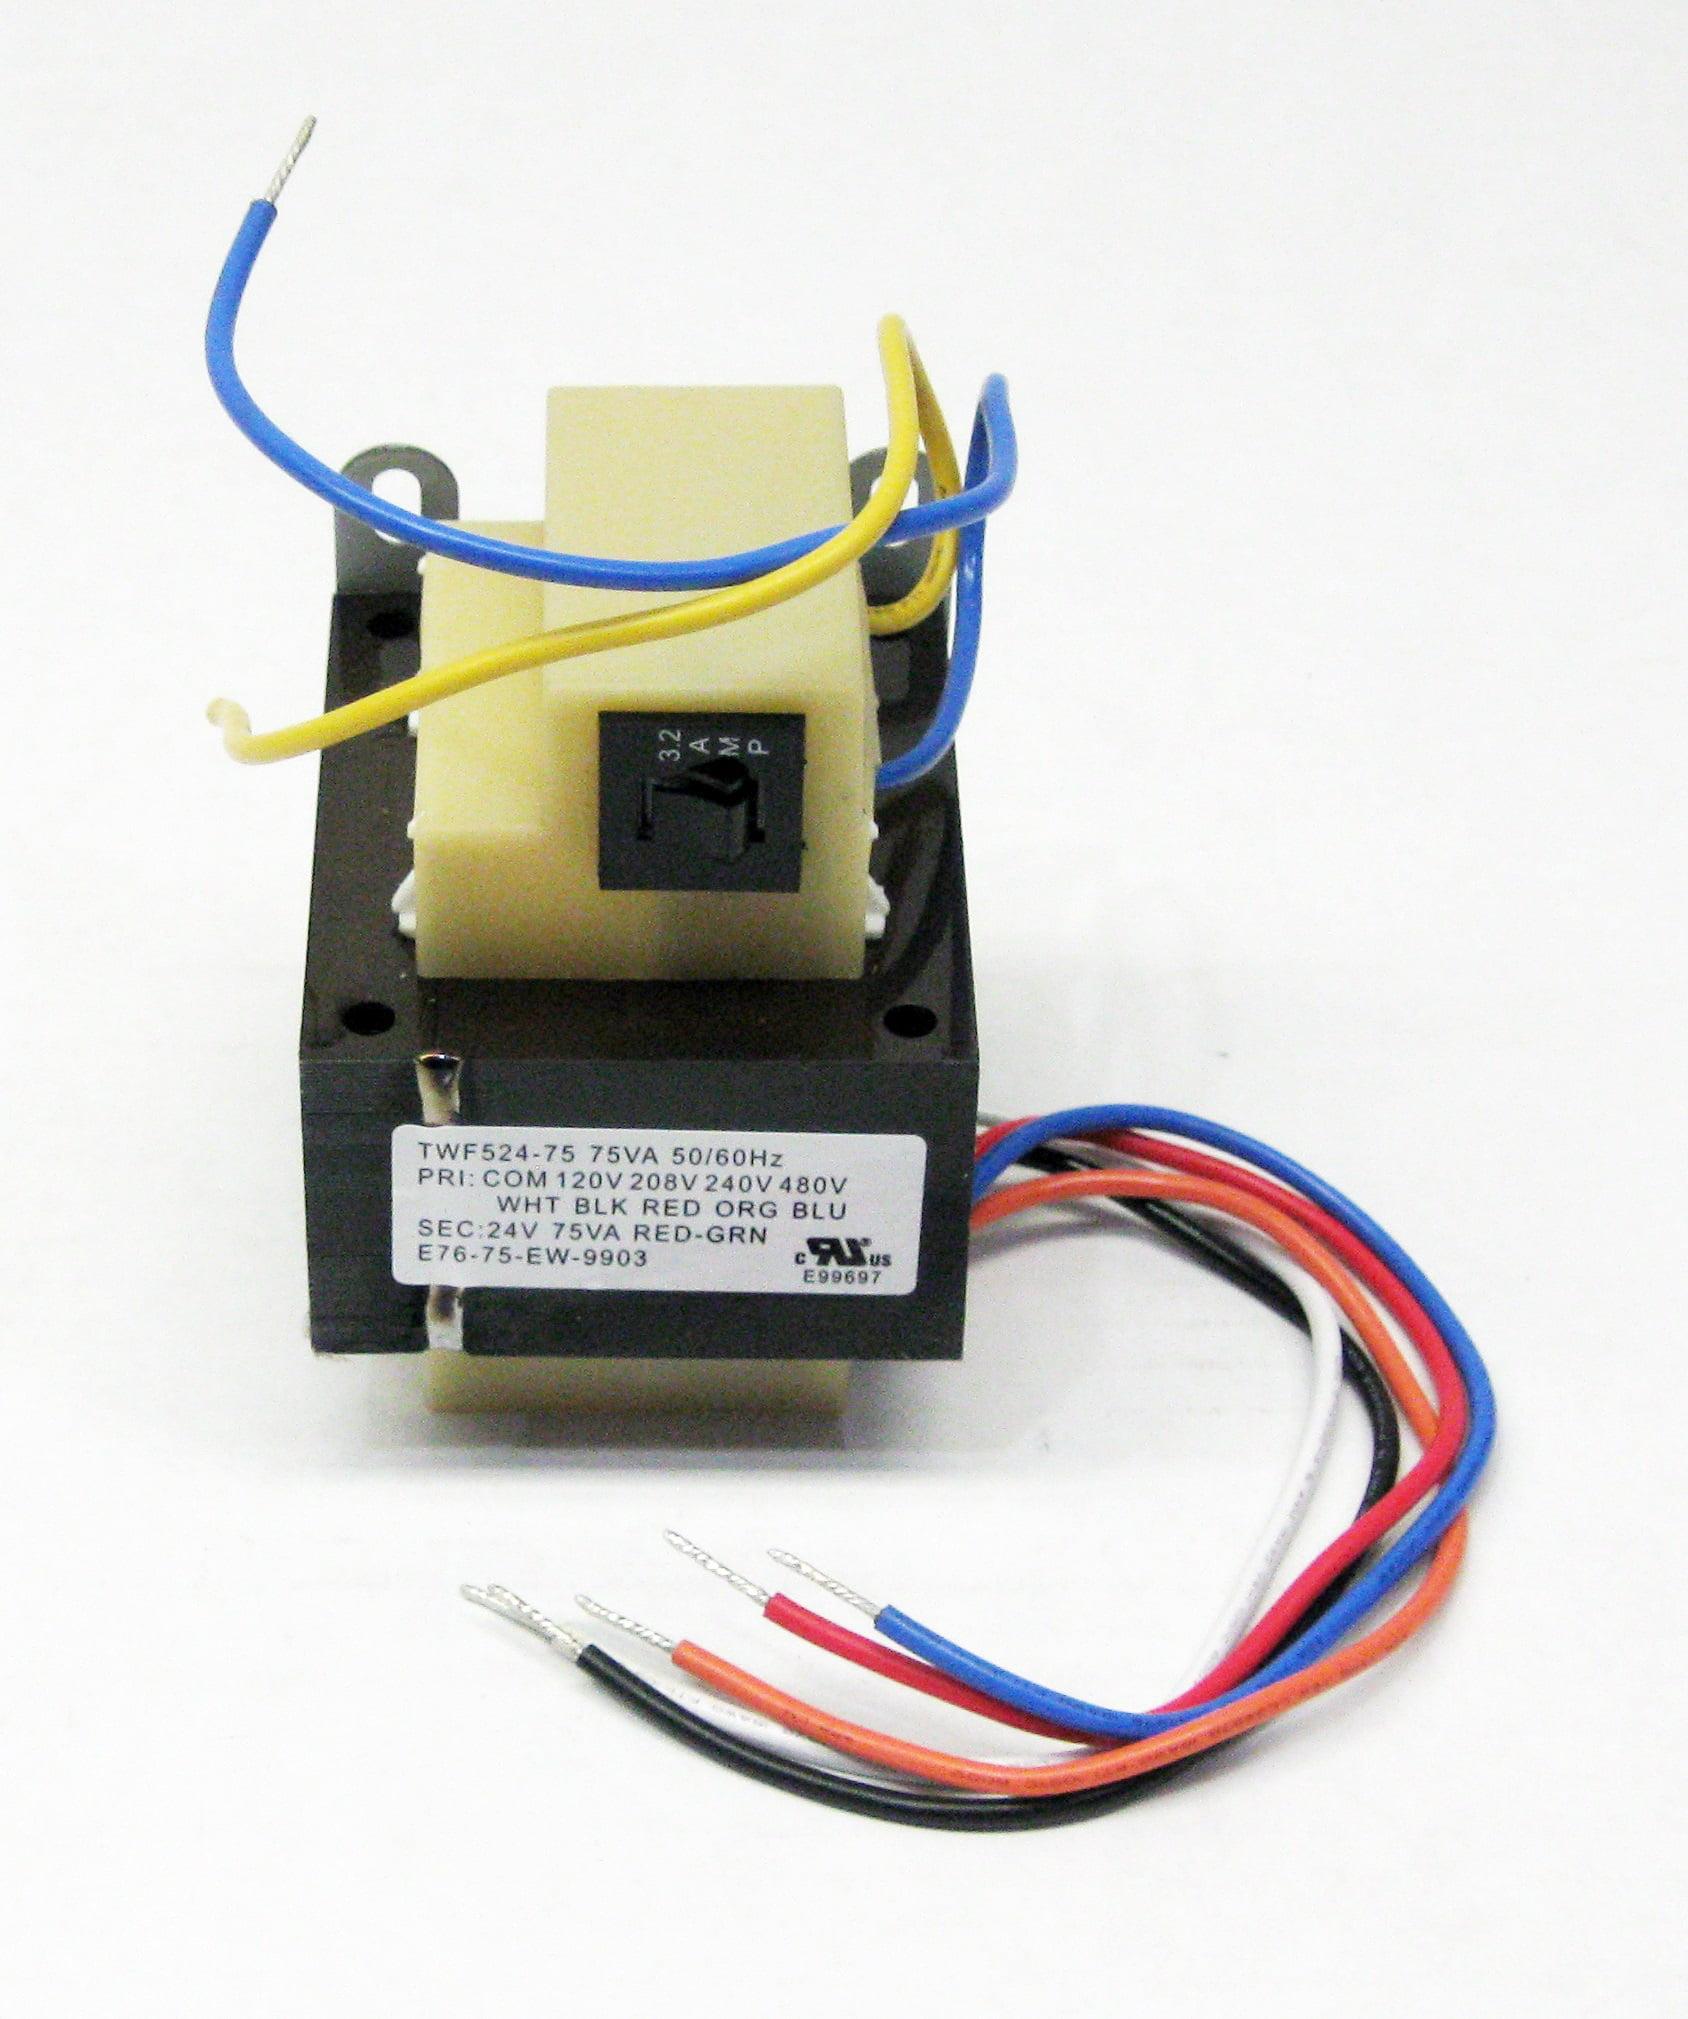 75VA Transformer Primary 120V 208V 240V 480V Volt 24V Secondary HVAC on